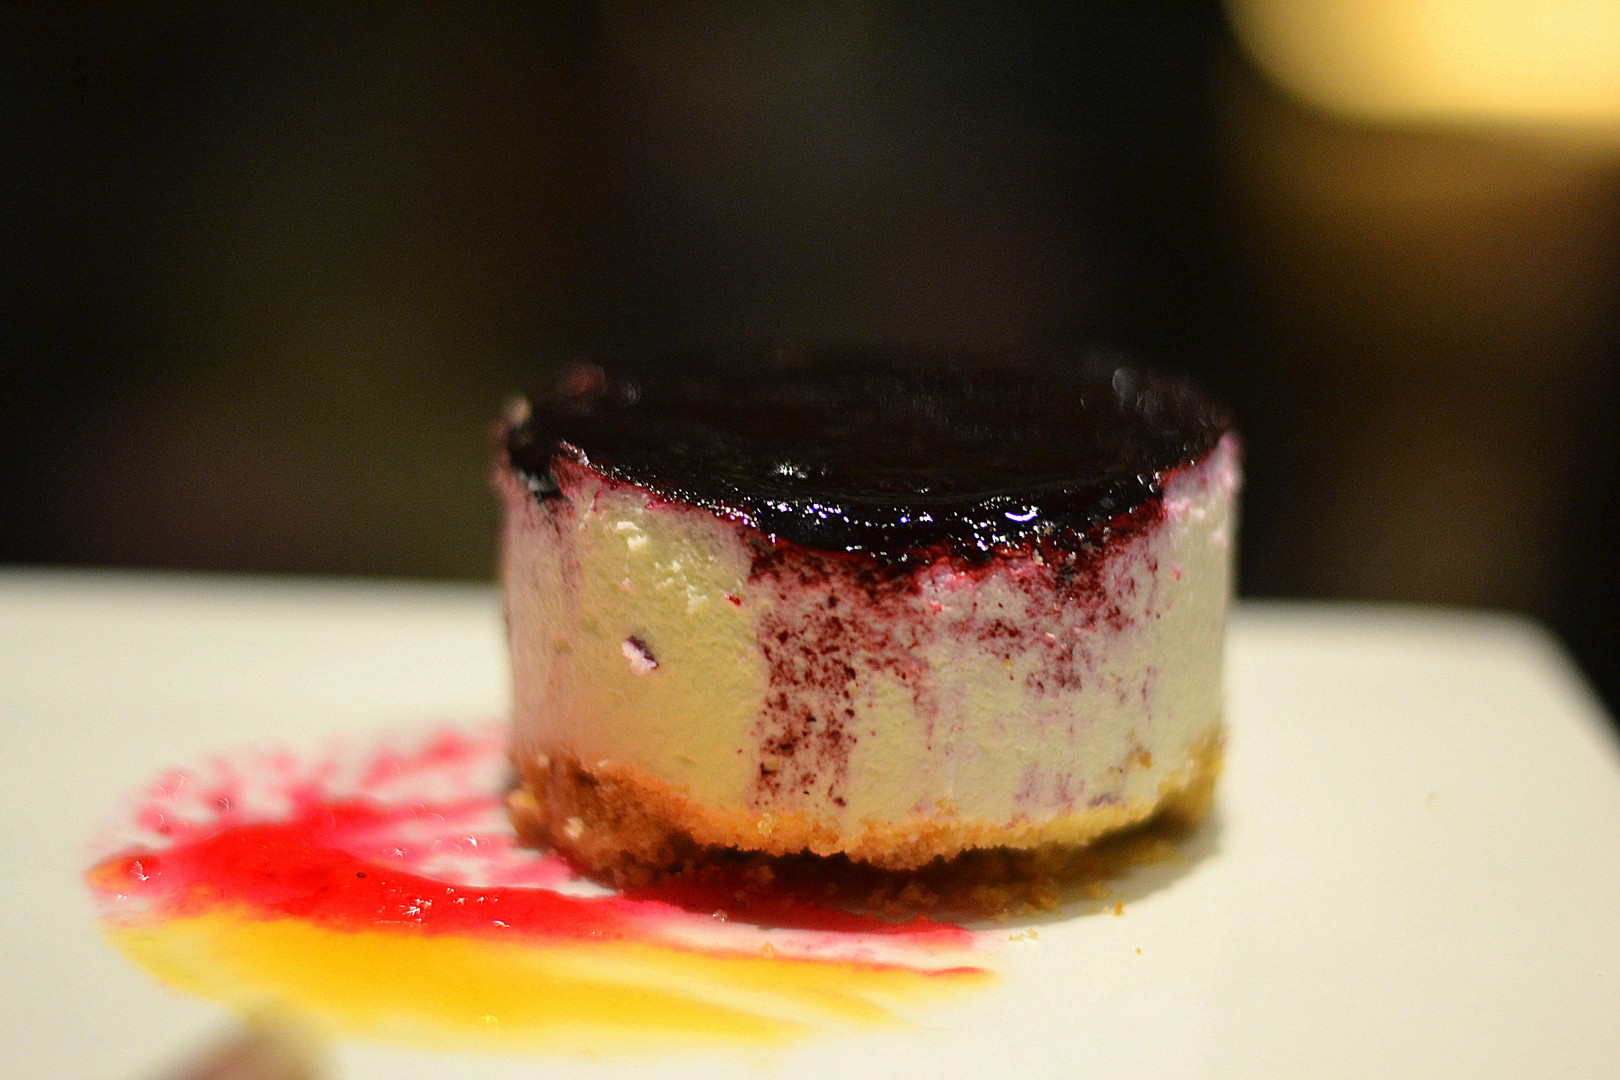 BLUBEERRY CHEESE CAKE